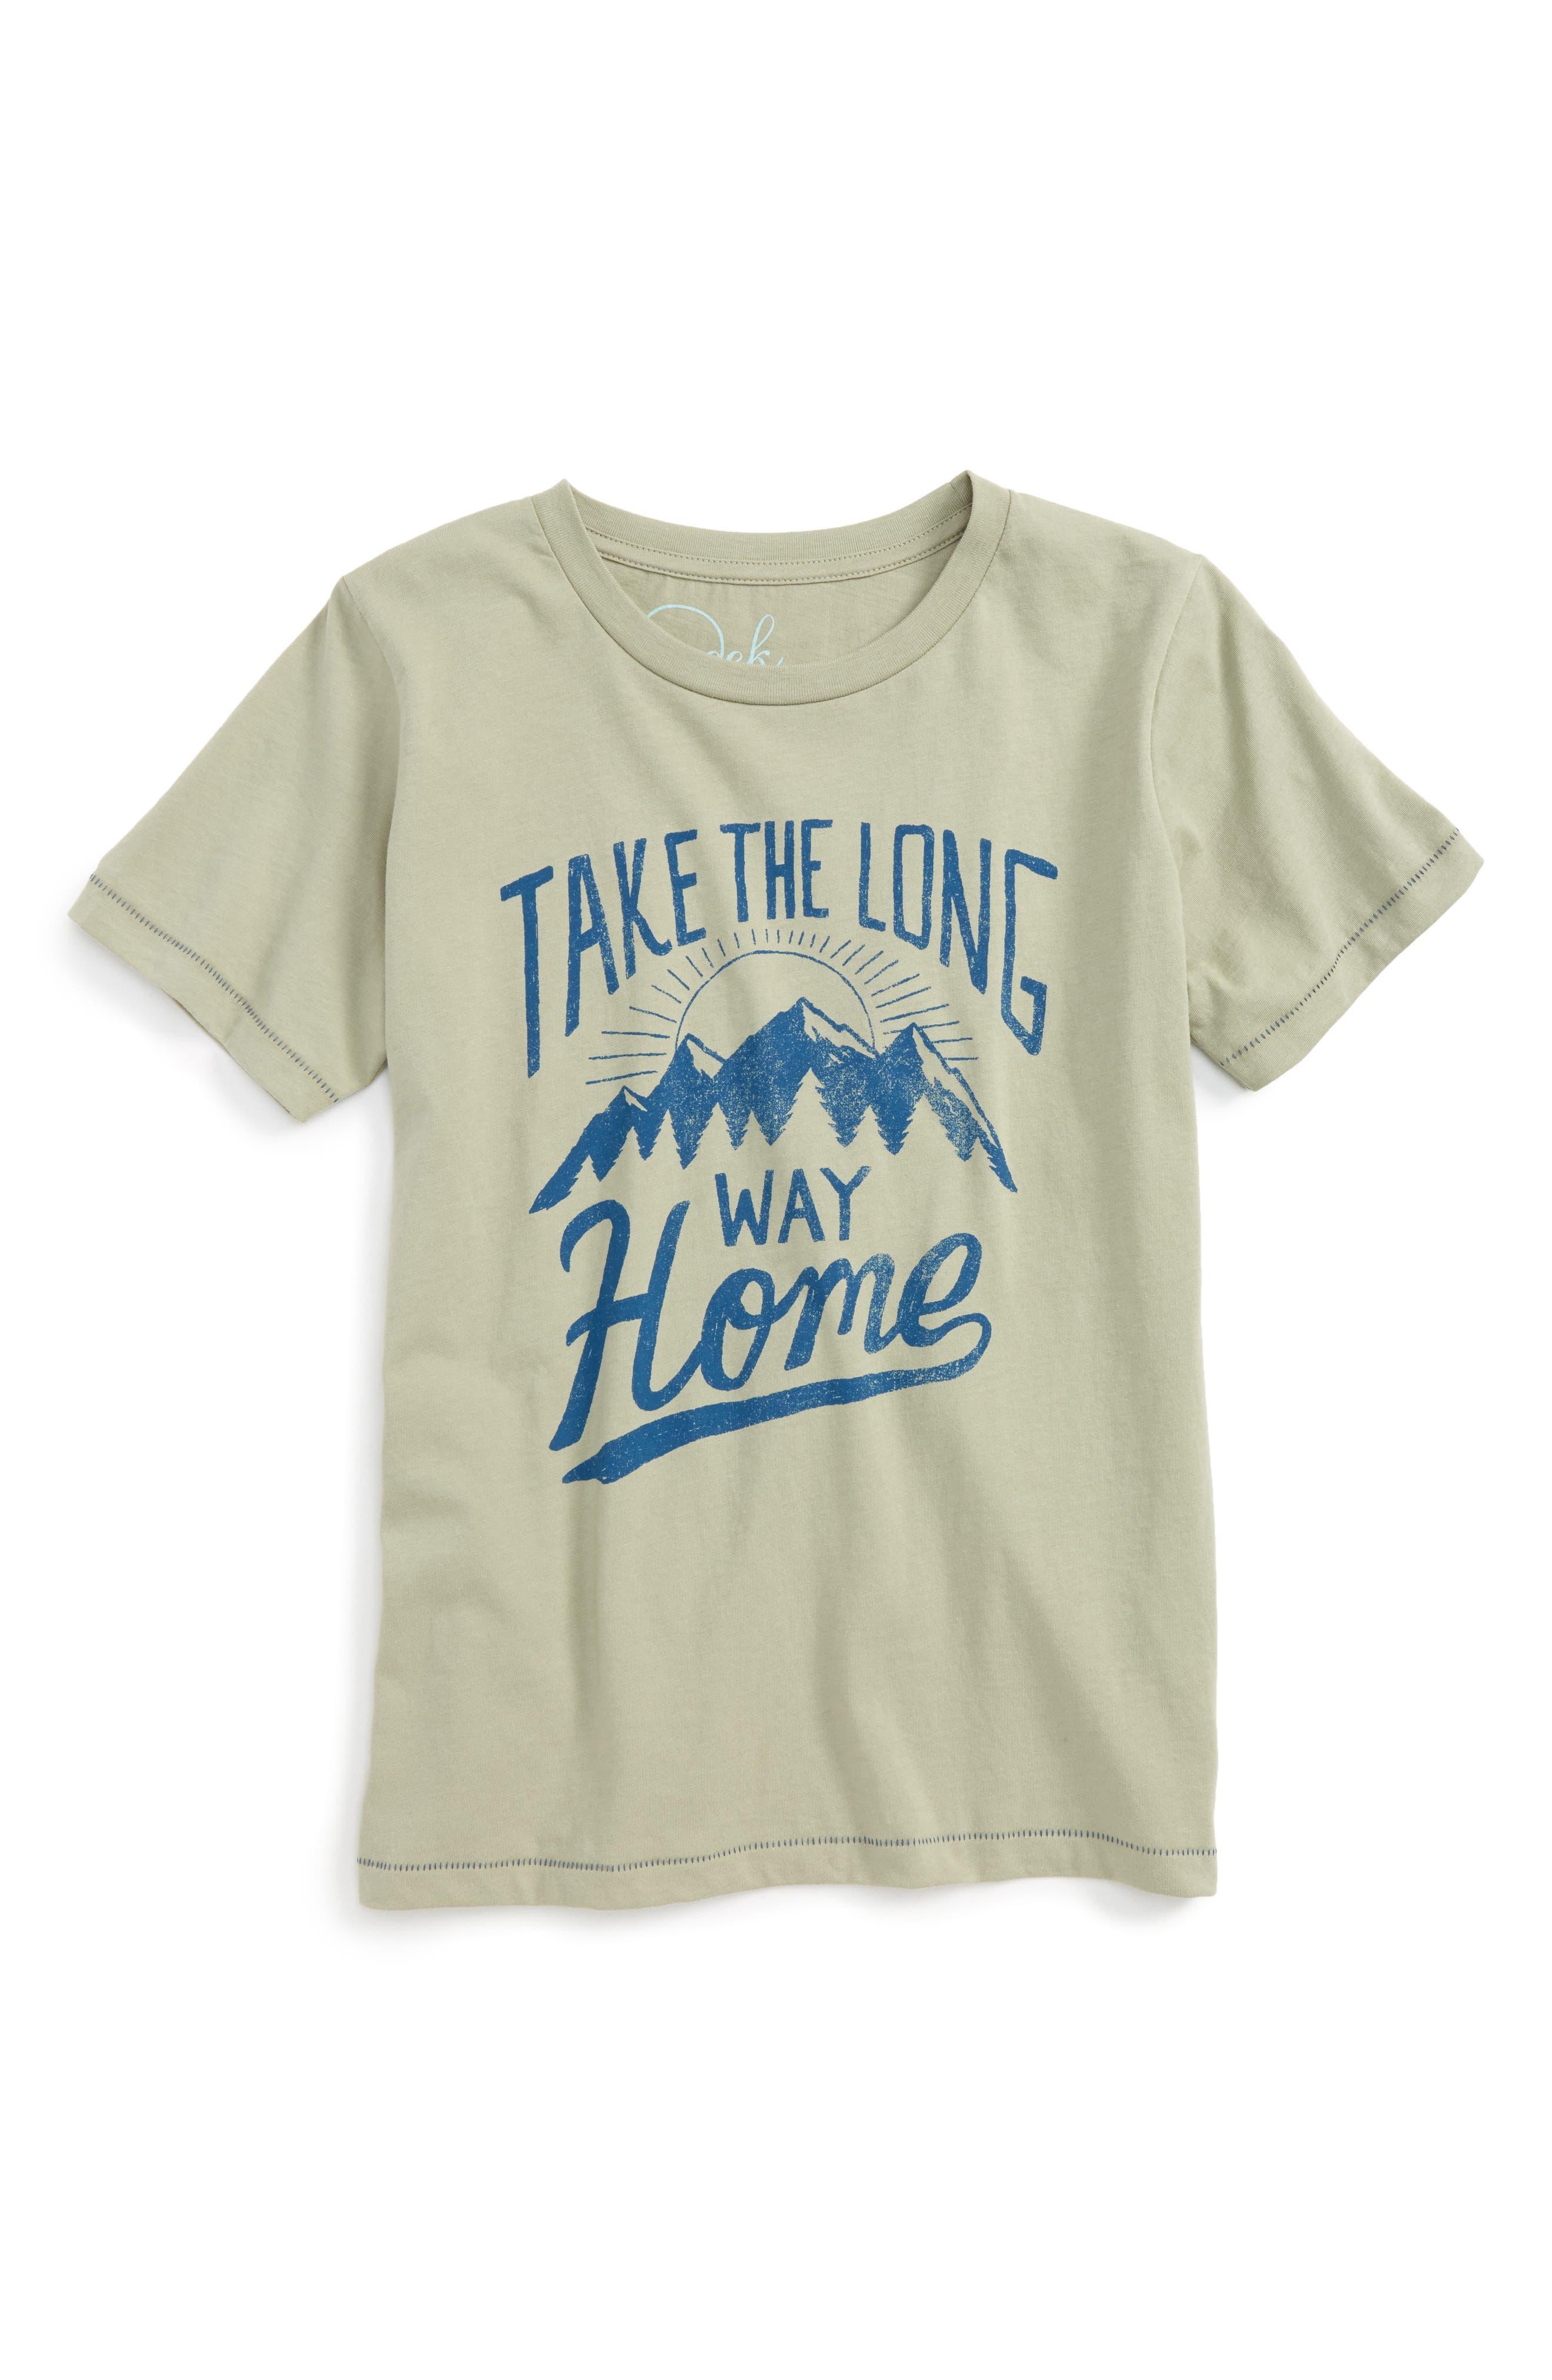 Main Image - Peek Long Way Home T-Shirt (Toddler Boys, Little Boys & Big Boys)